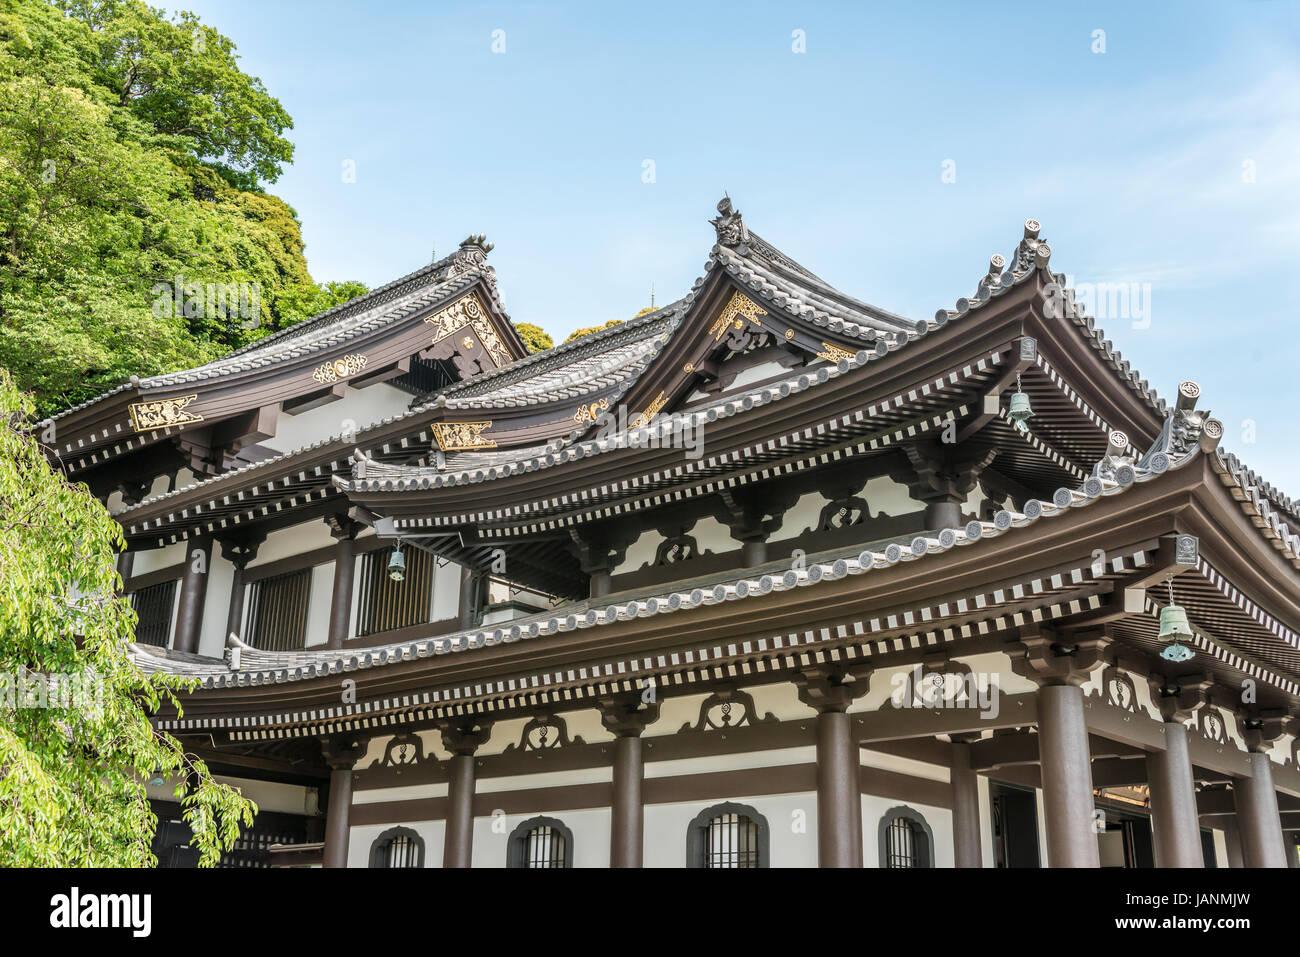 Kannon-do Hall of the Hase-dera temple, commonly called the Hase-kannon, one of the Buddhist temples in Kamakura, - Stock Image